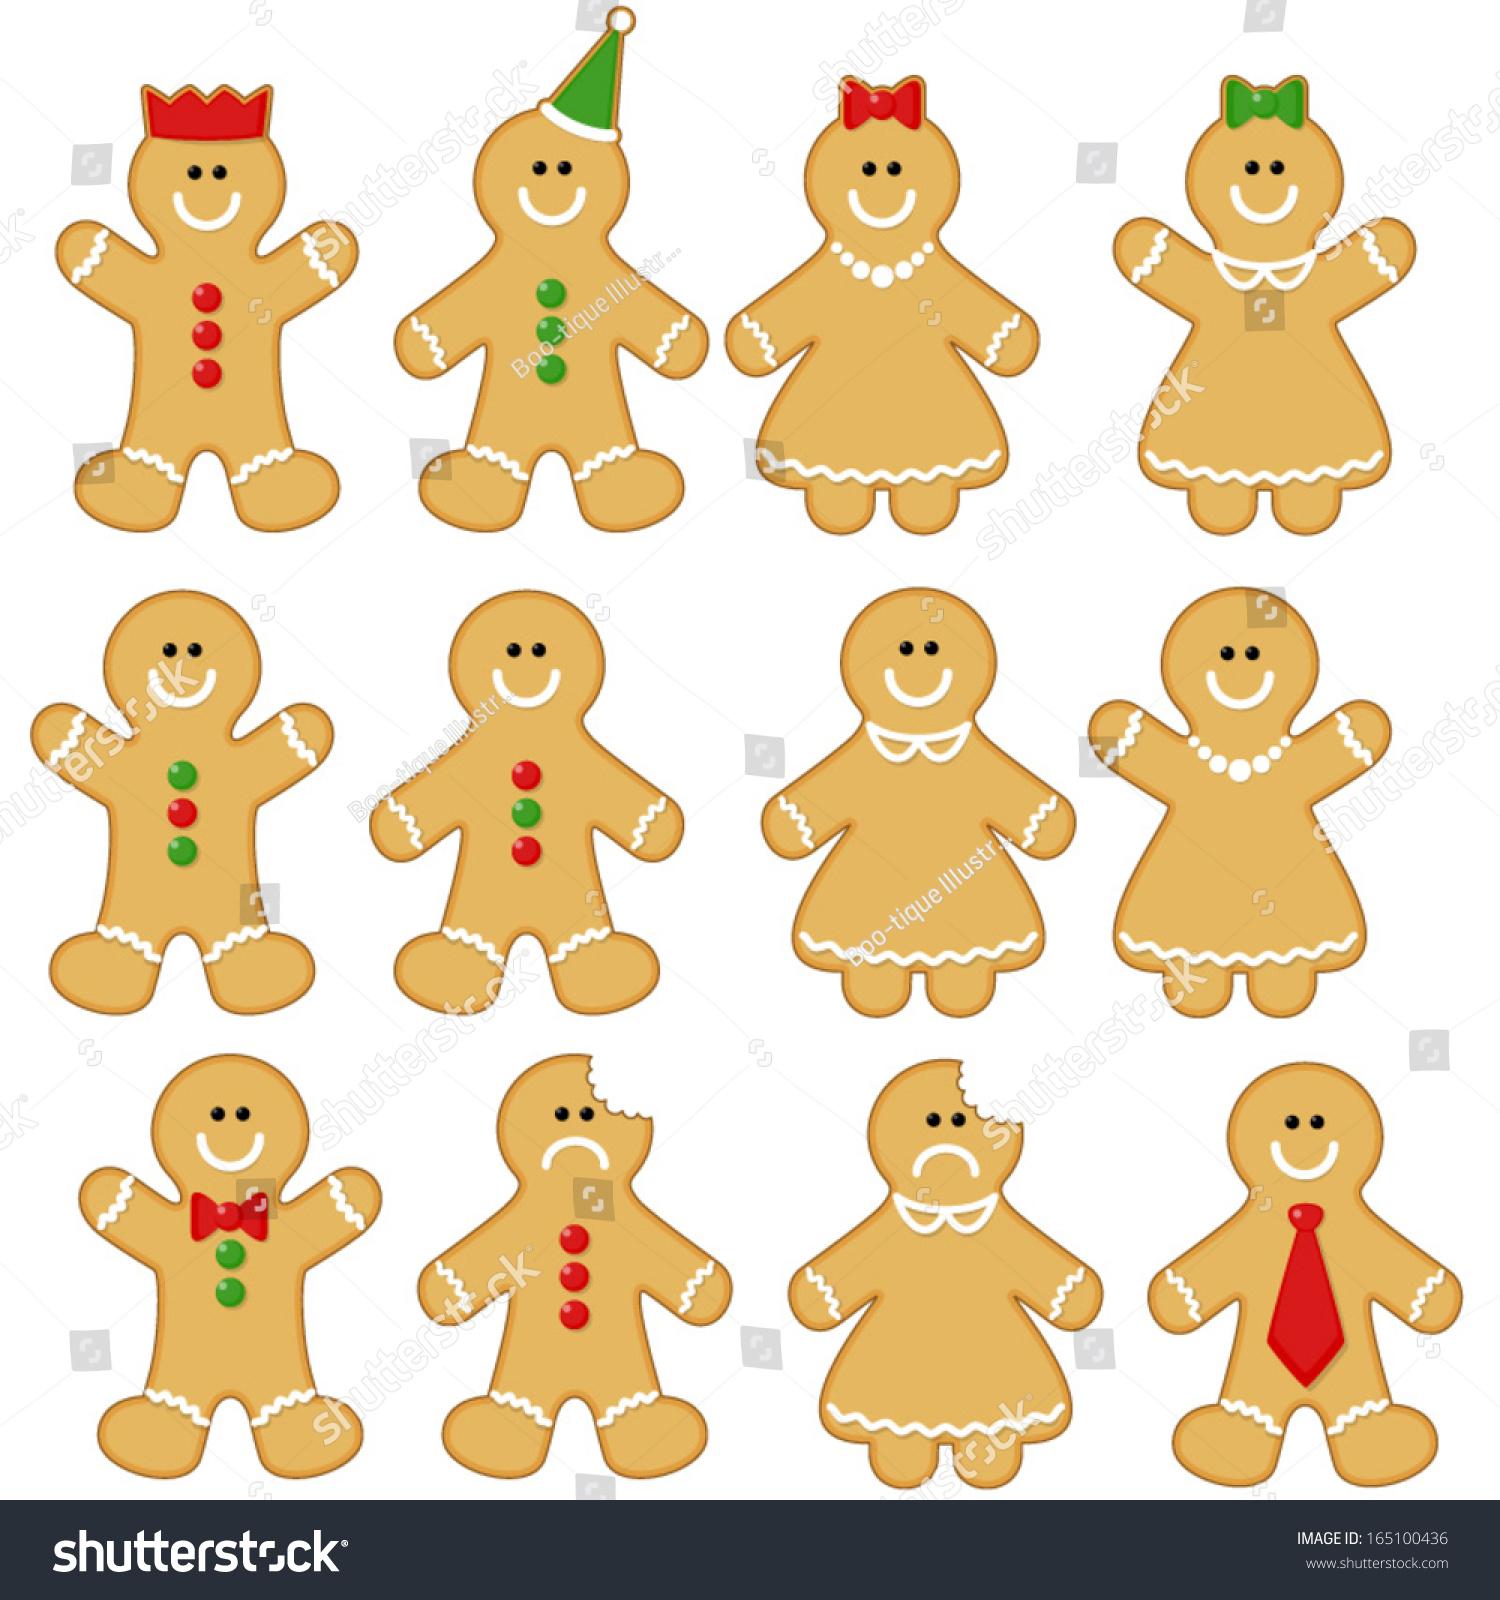 Gingerbread Man Clipart Set Gingerbread Man Stock Vector (Royalty.